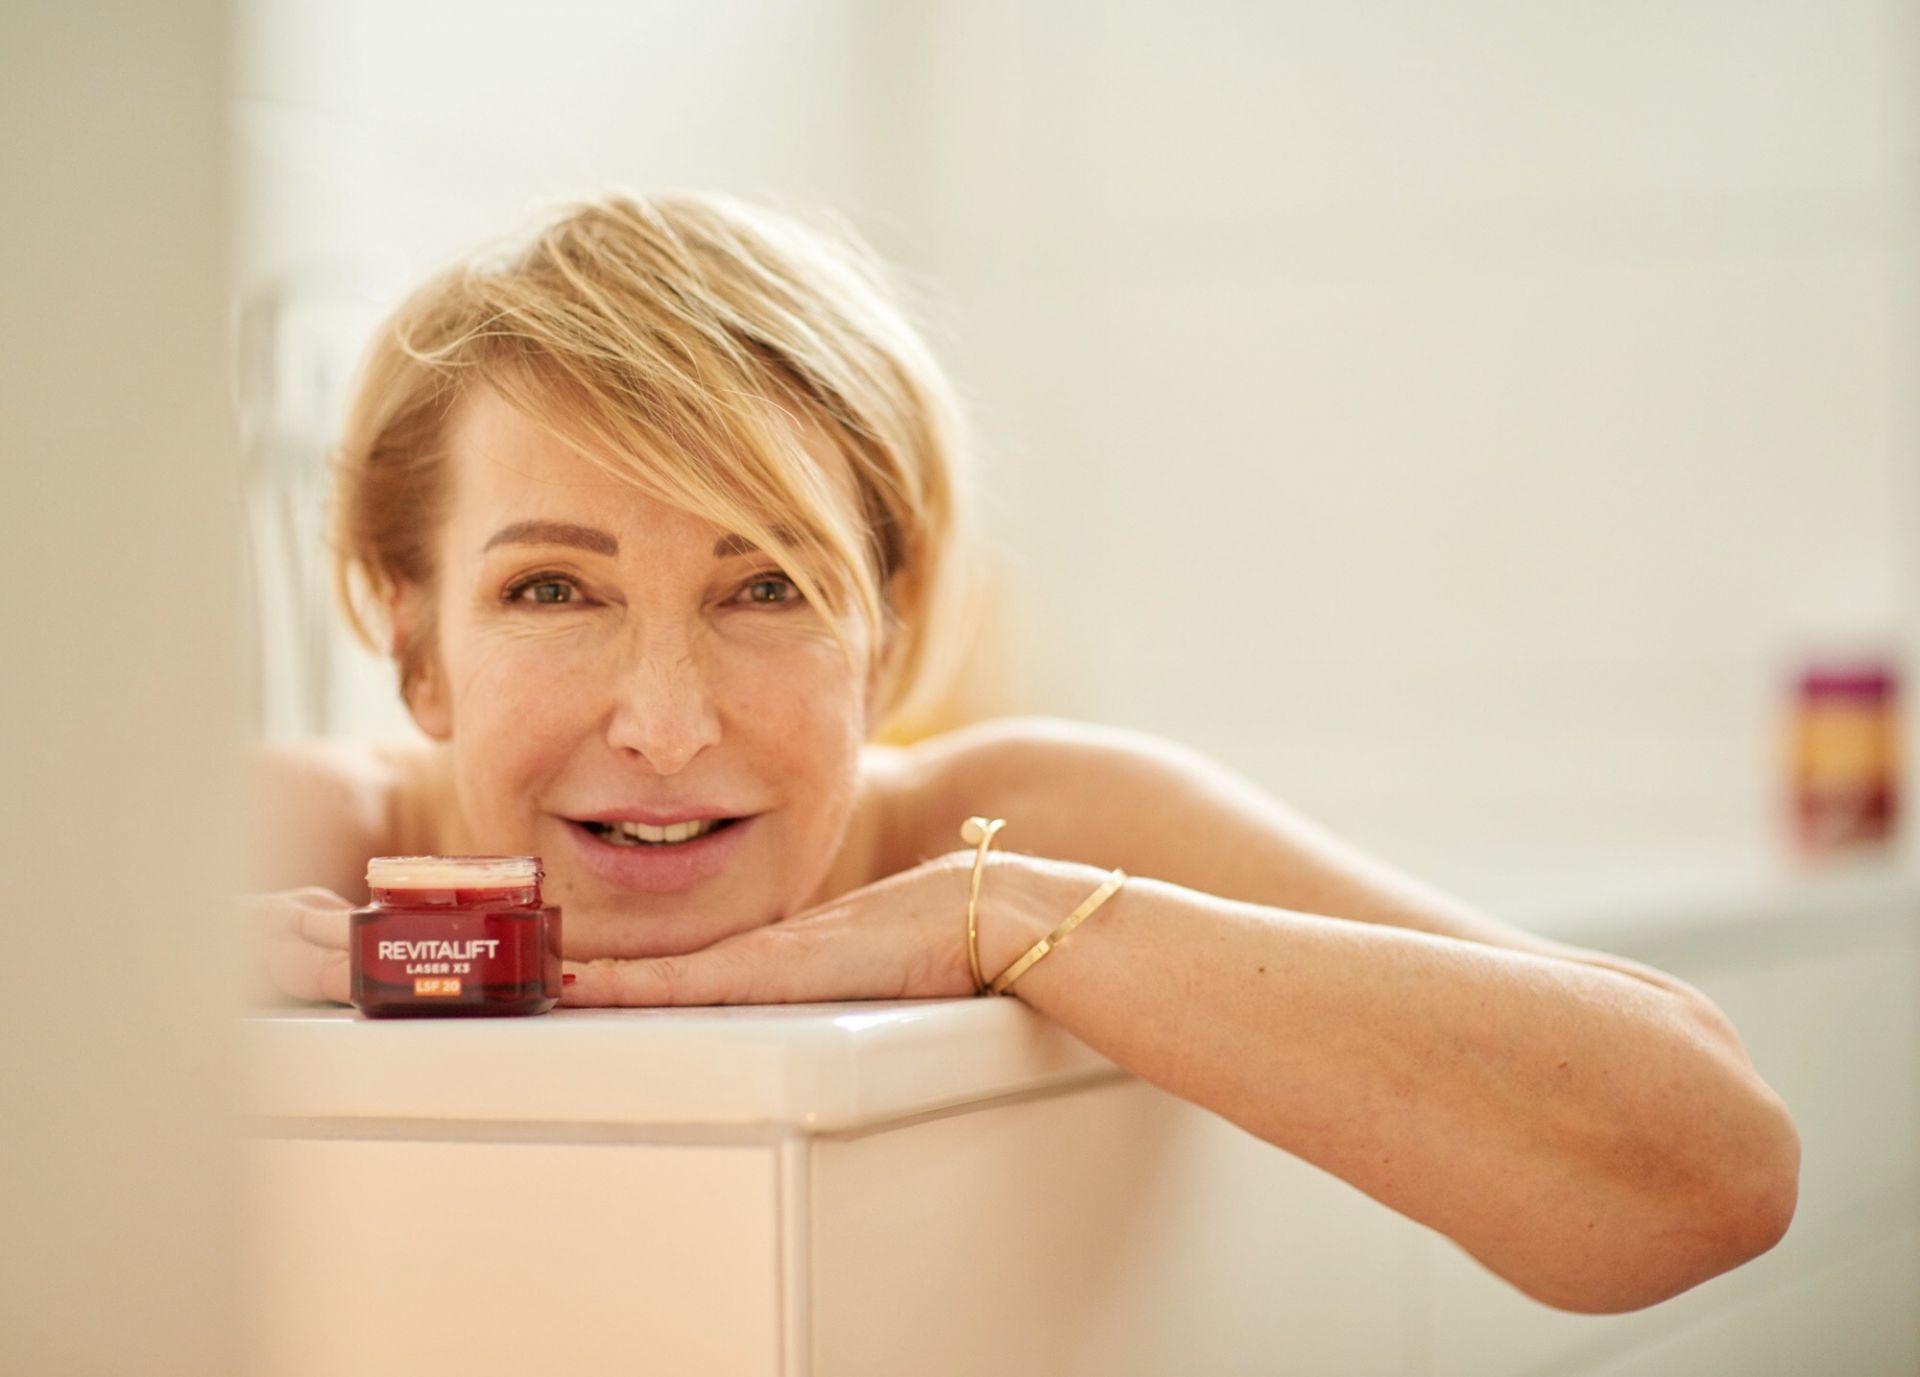 glamupyourlifestyle Haut Gesichtspflege Peeling Revitalift-Ampullen -Erfahrung ue-40-blog ue-50-blog